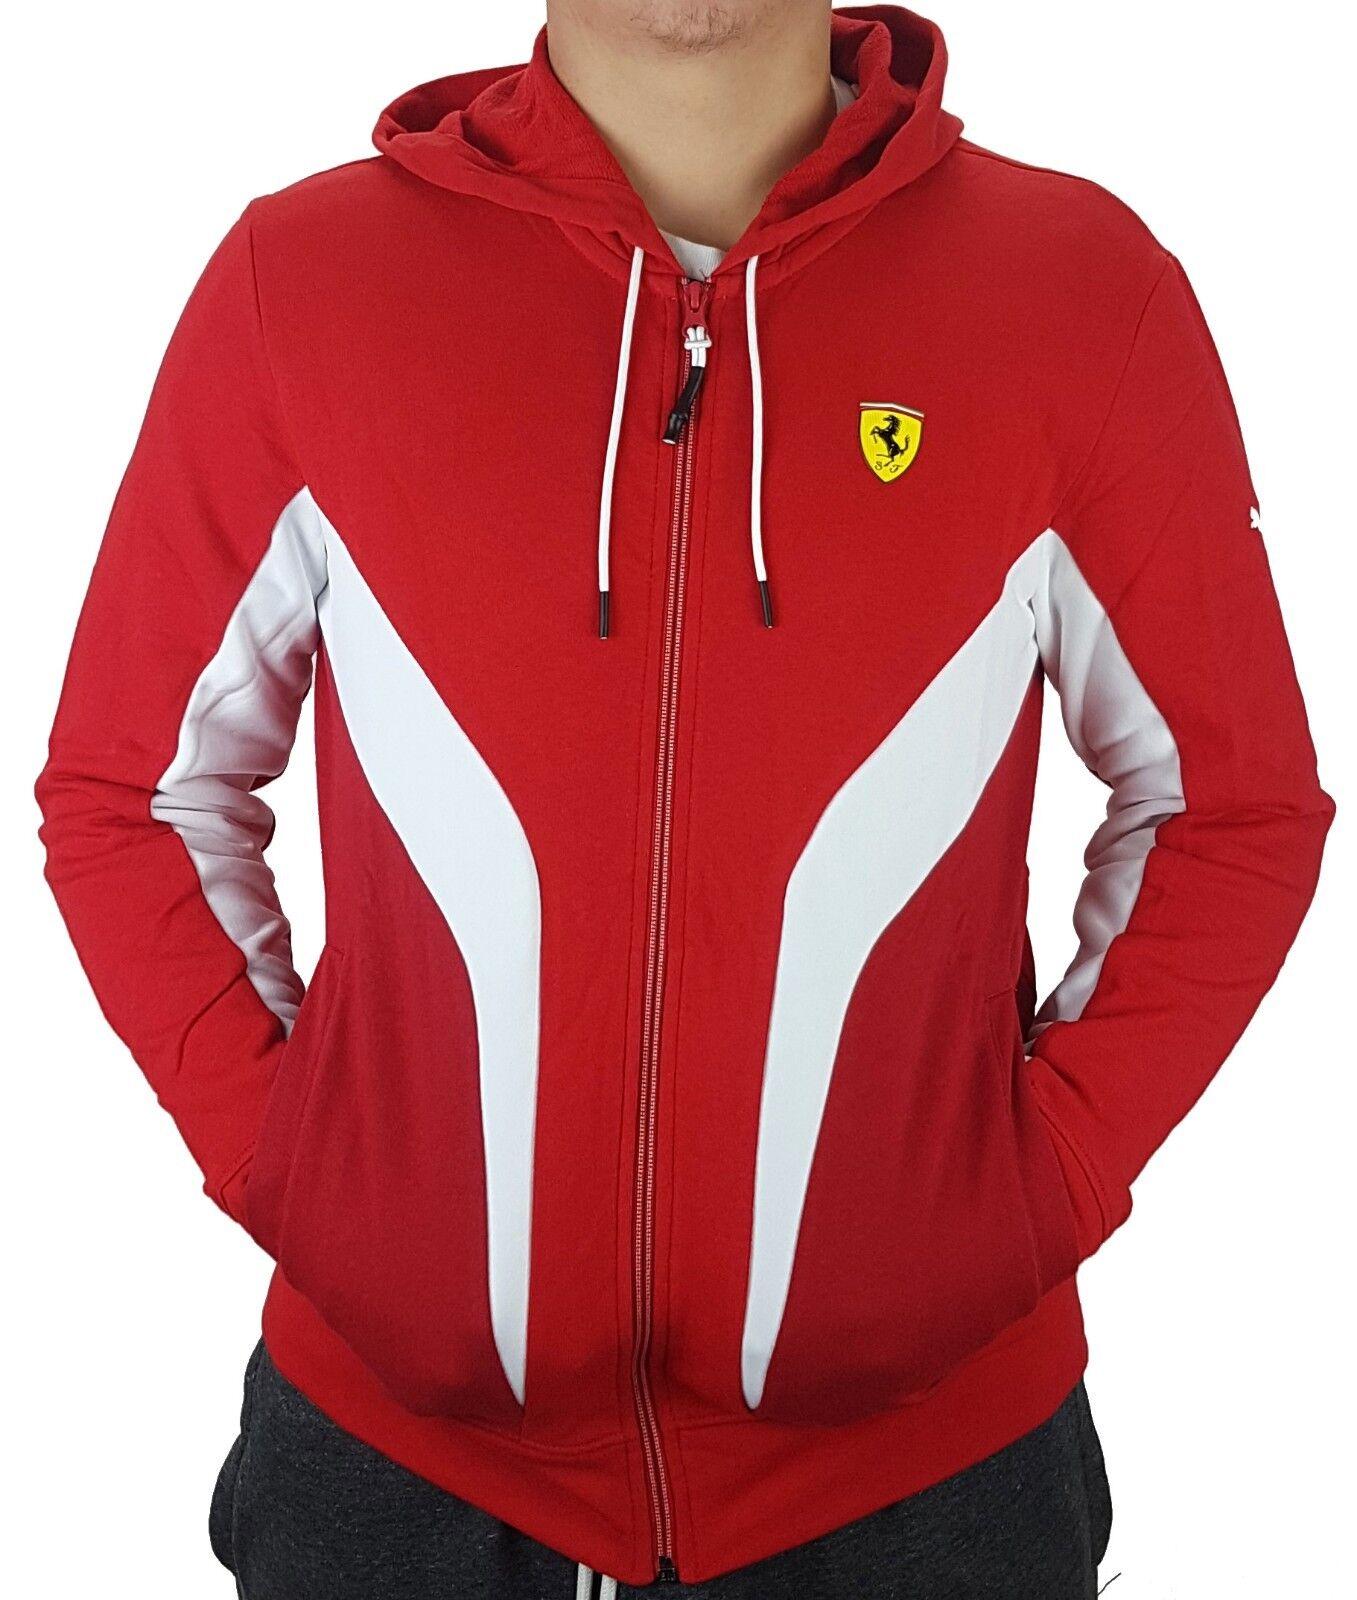 Puma Scuderia Ferrari Hoody Sweatjacke Kapuzenpullover Formel 1 Jacke Rot M   L